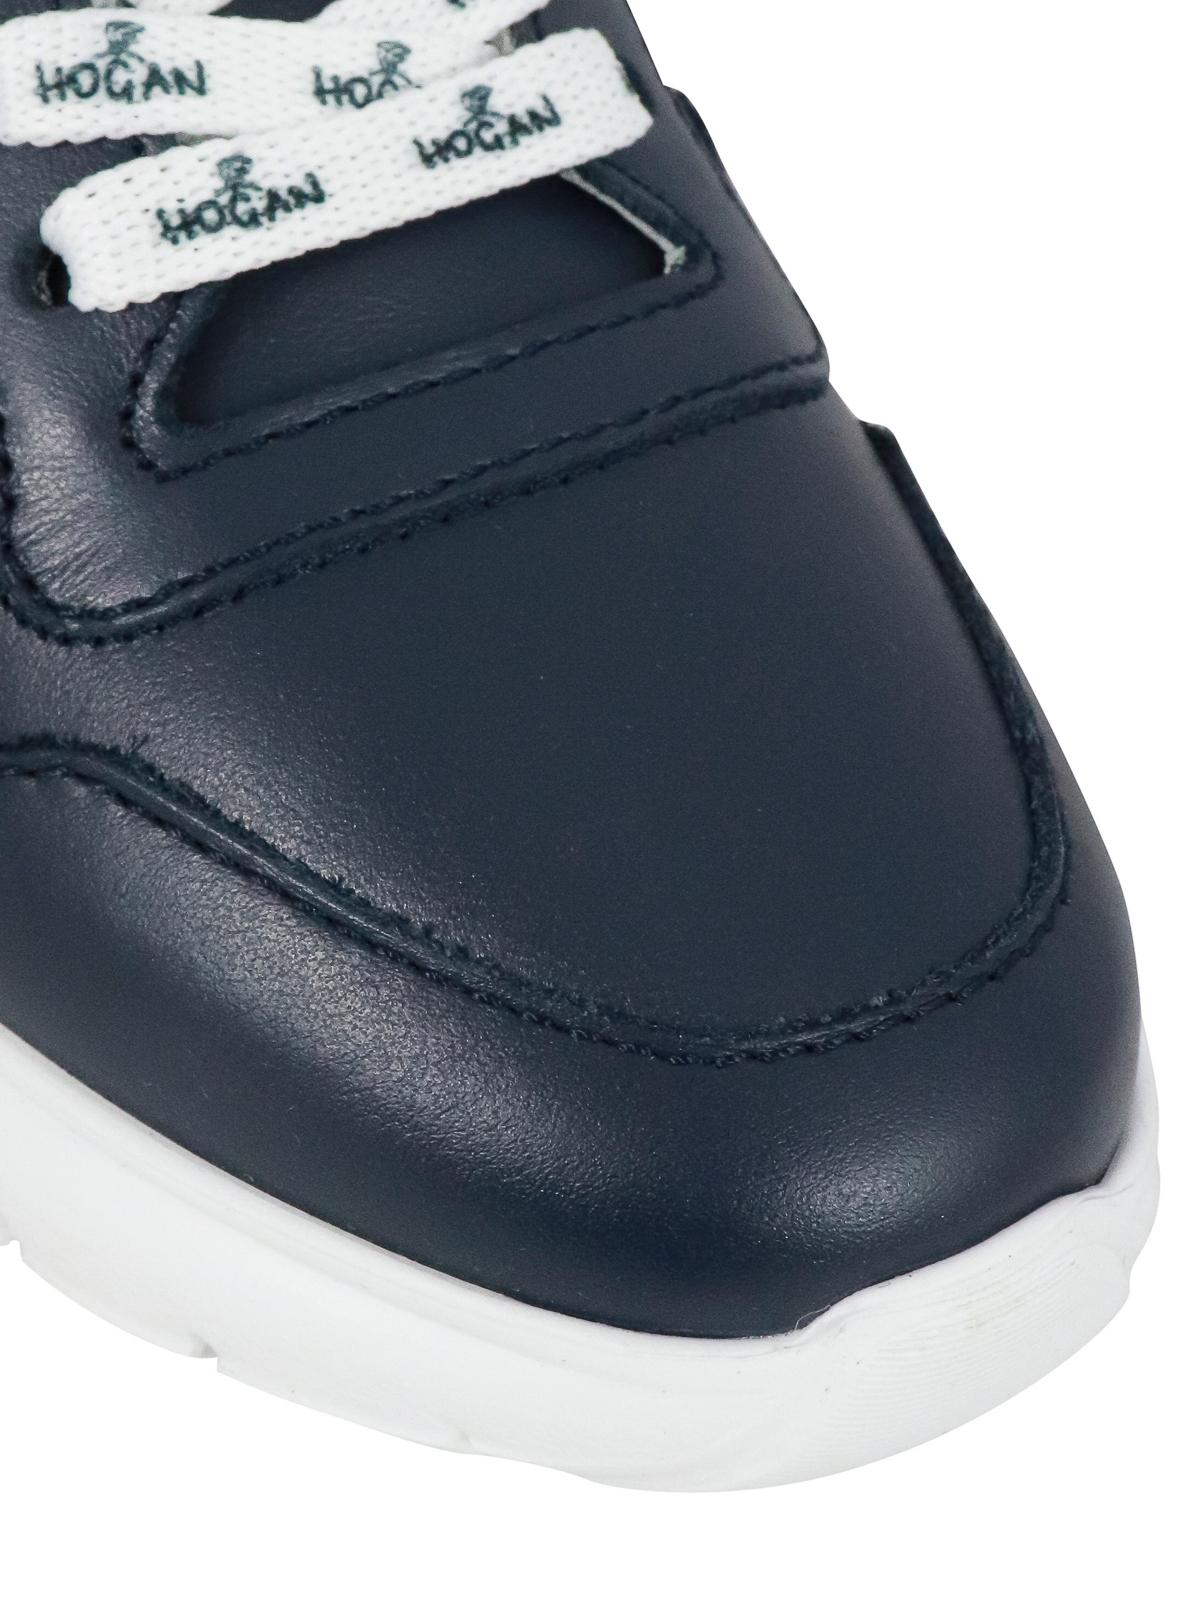 Hogan Junior - Interactive³ sneakers - trainers - HXC3710CO20G9QAU51